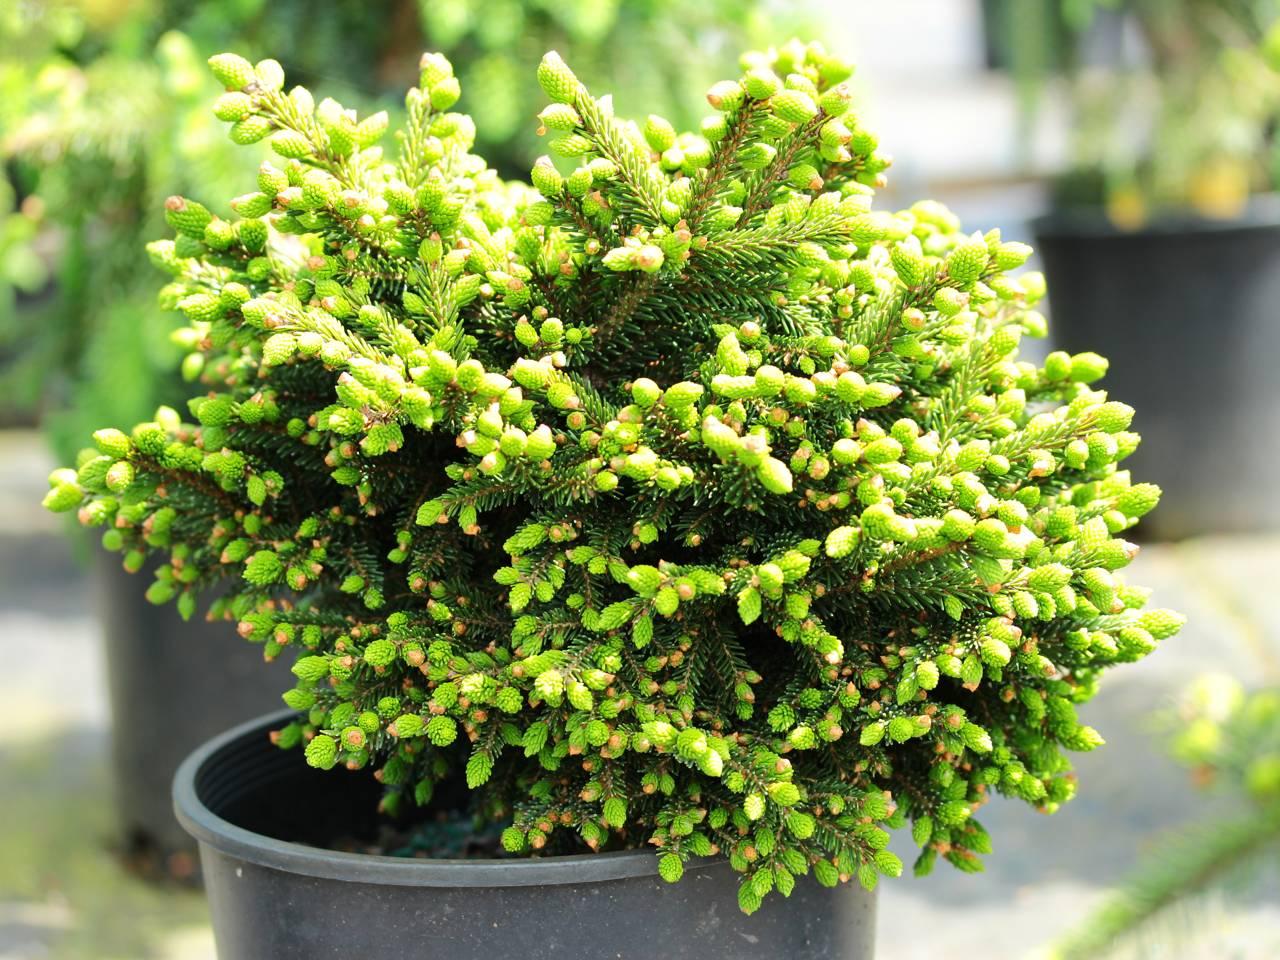 Picea orientalis Mt. Vernon conifer compact green dense mounding small